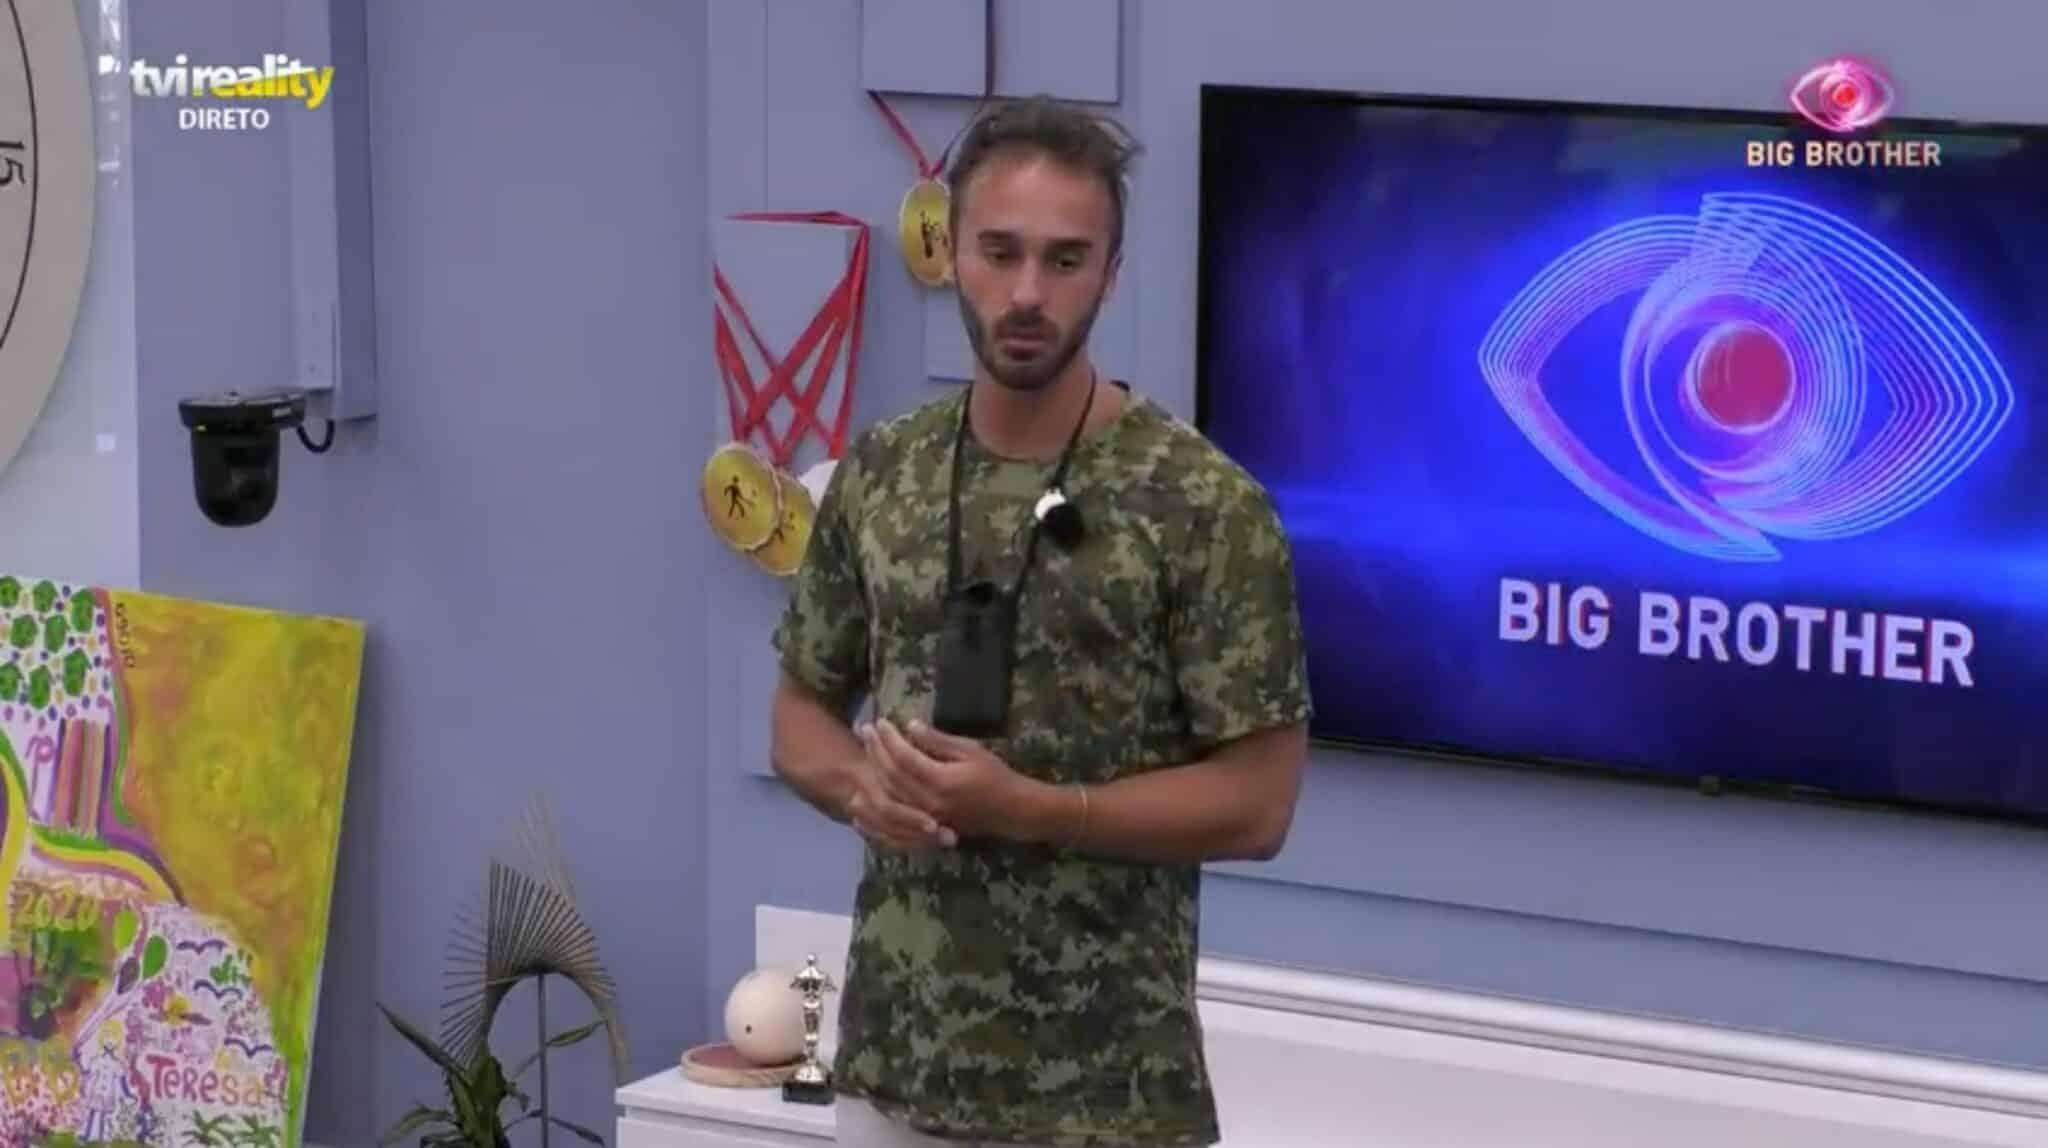 Big-Brother-Daniel-Guerreiro-2